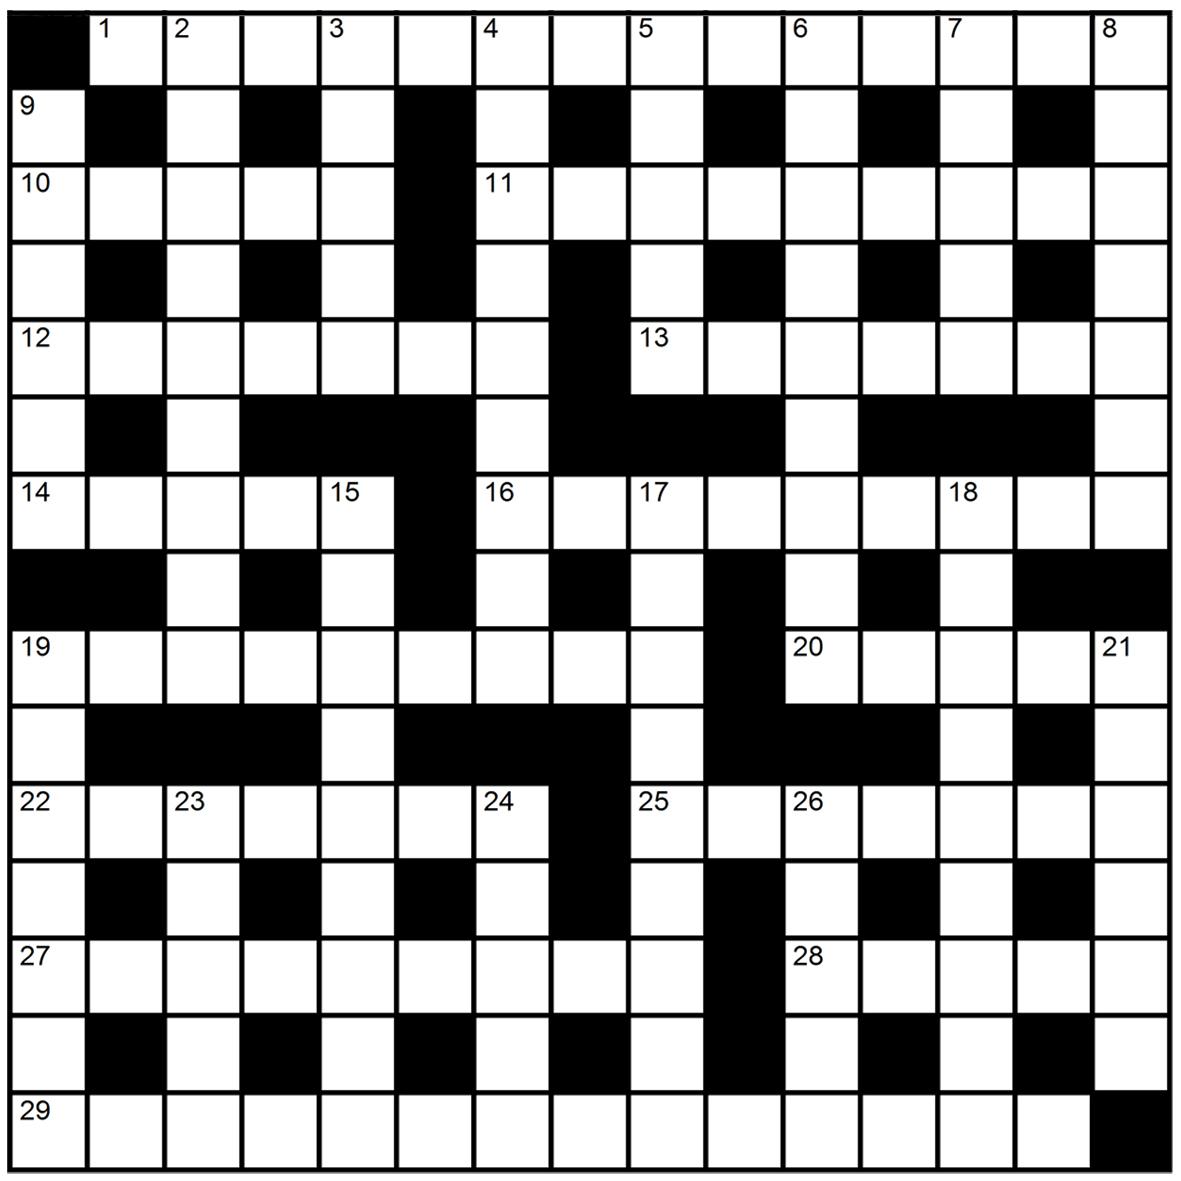 Crossword 5 new scientist for Fishing net crossword clue